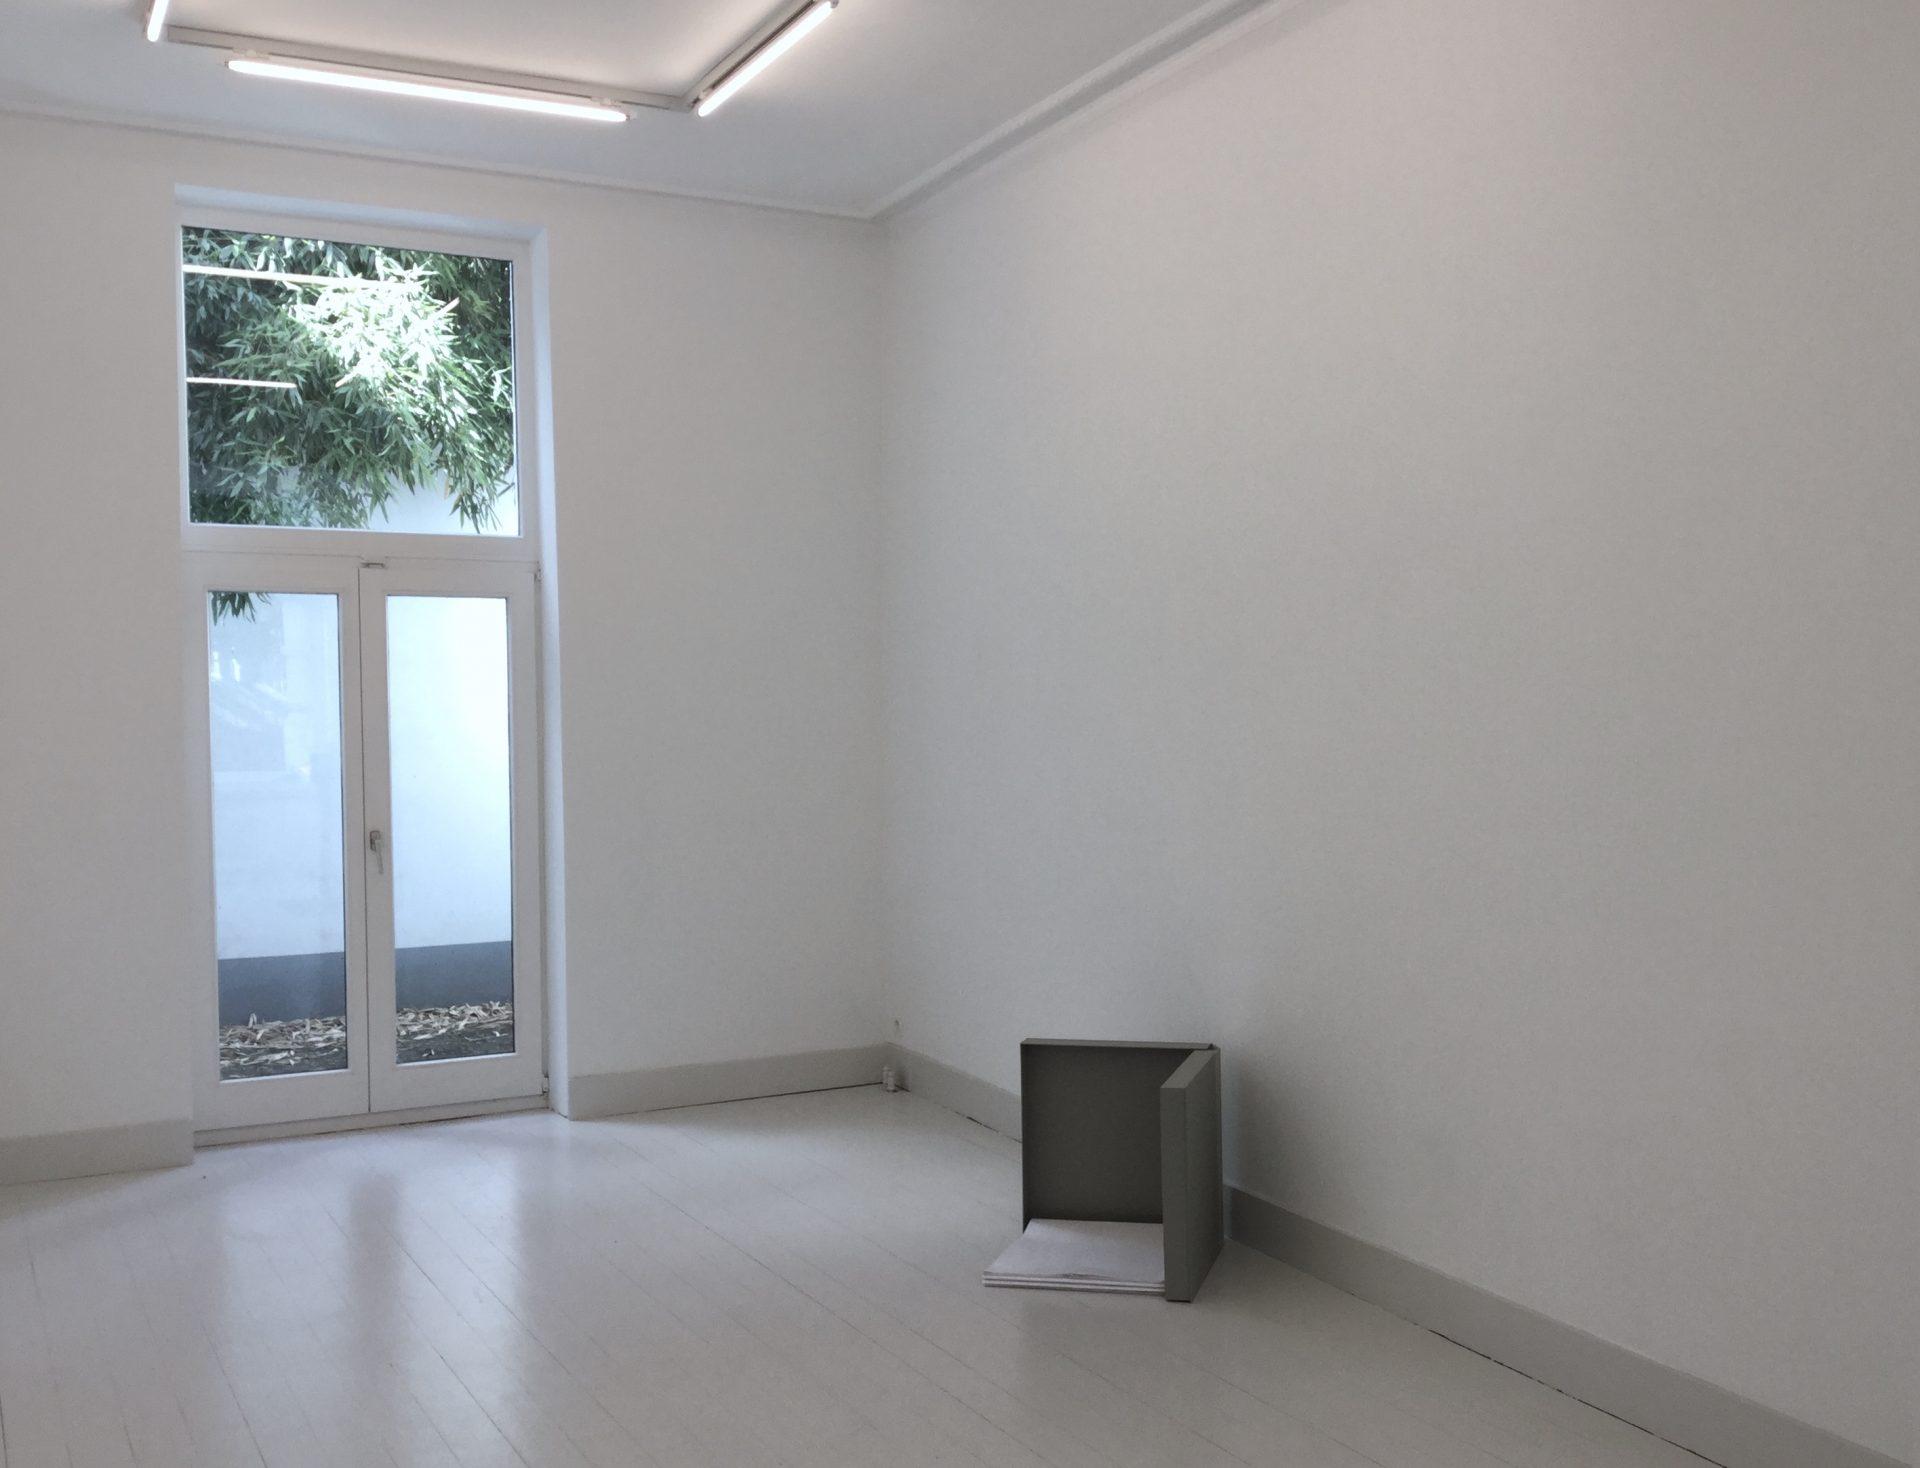 David Lamelas Pared Doblada at Jan Mot 2018-IMG_0873